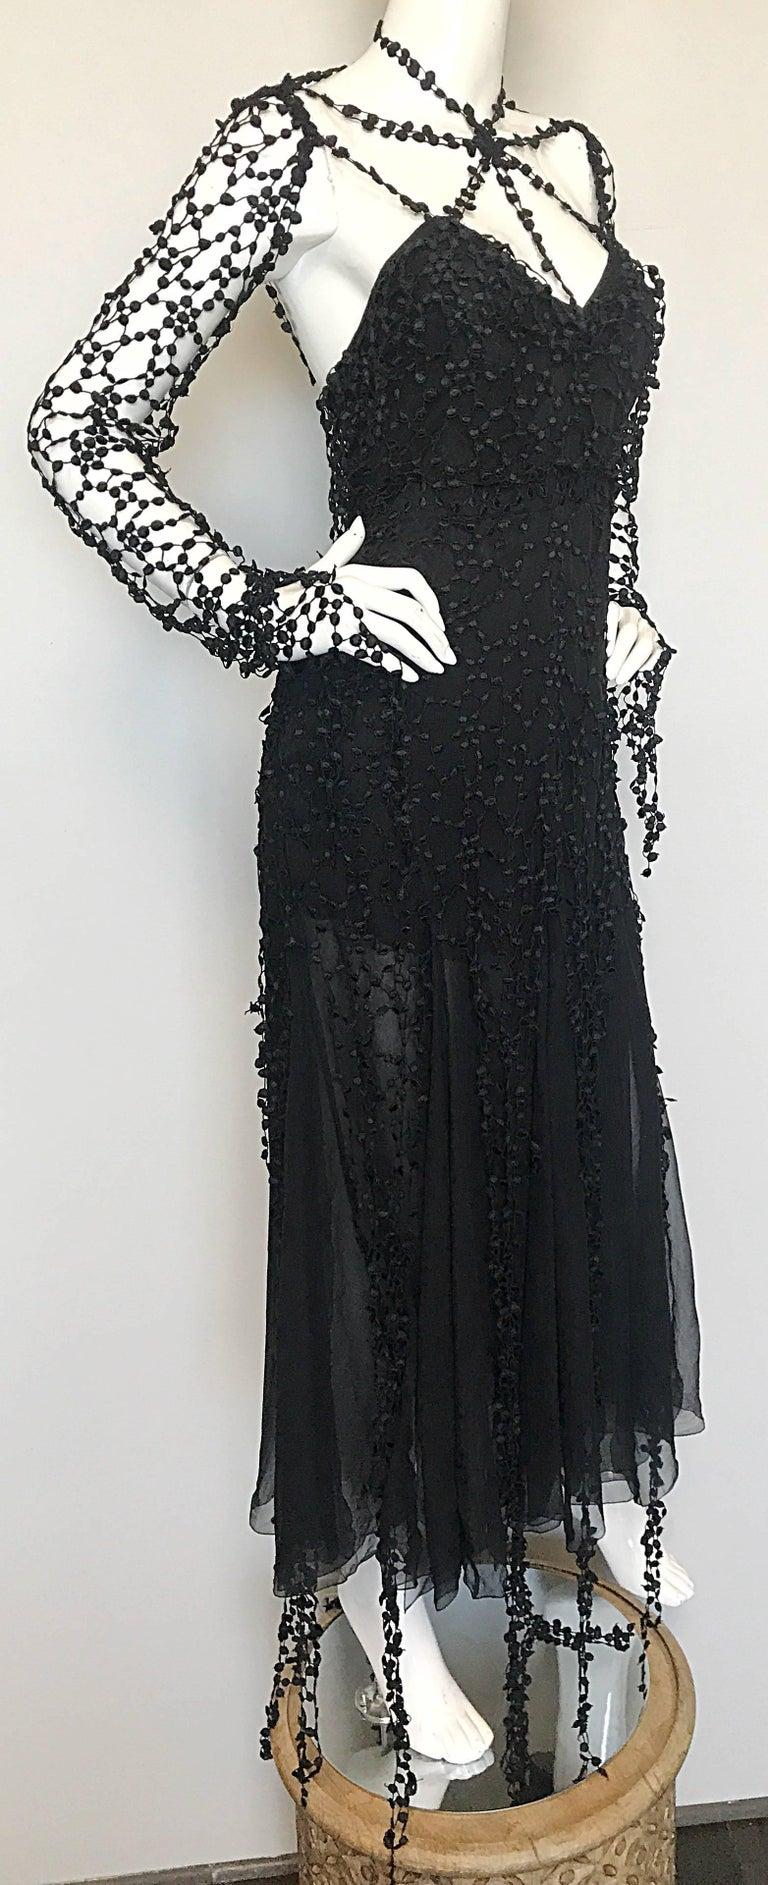 1990s Karl Lagerfeld Vintage ' Spiderweb ' Black Silk Chiffon Vintage 90s Dress For Sale 2